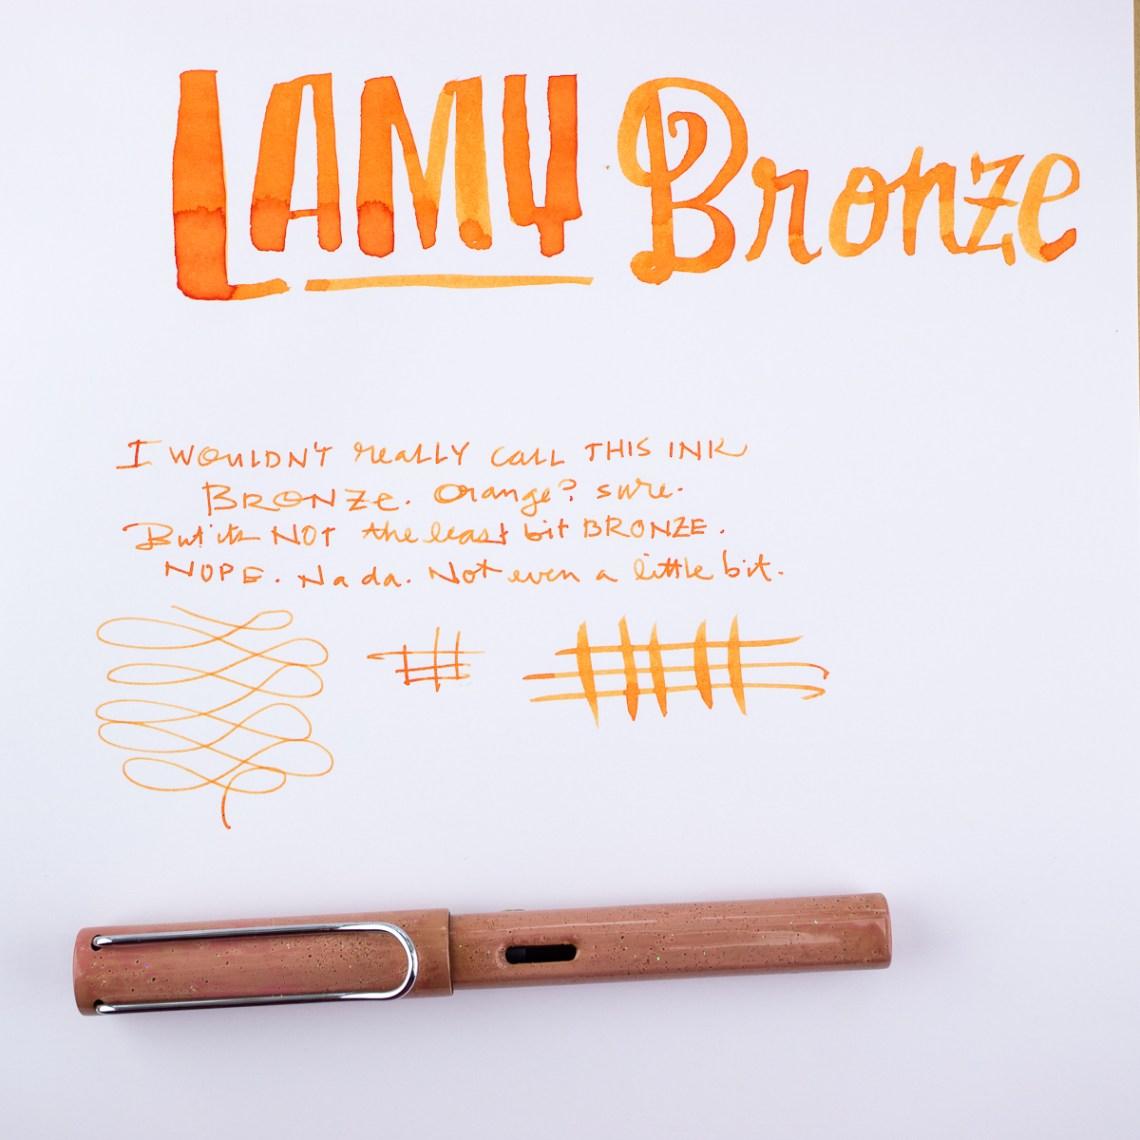 Lamy Bronze writing sample